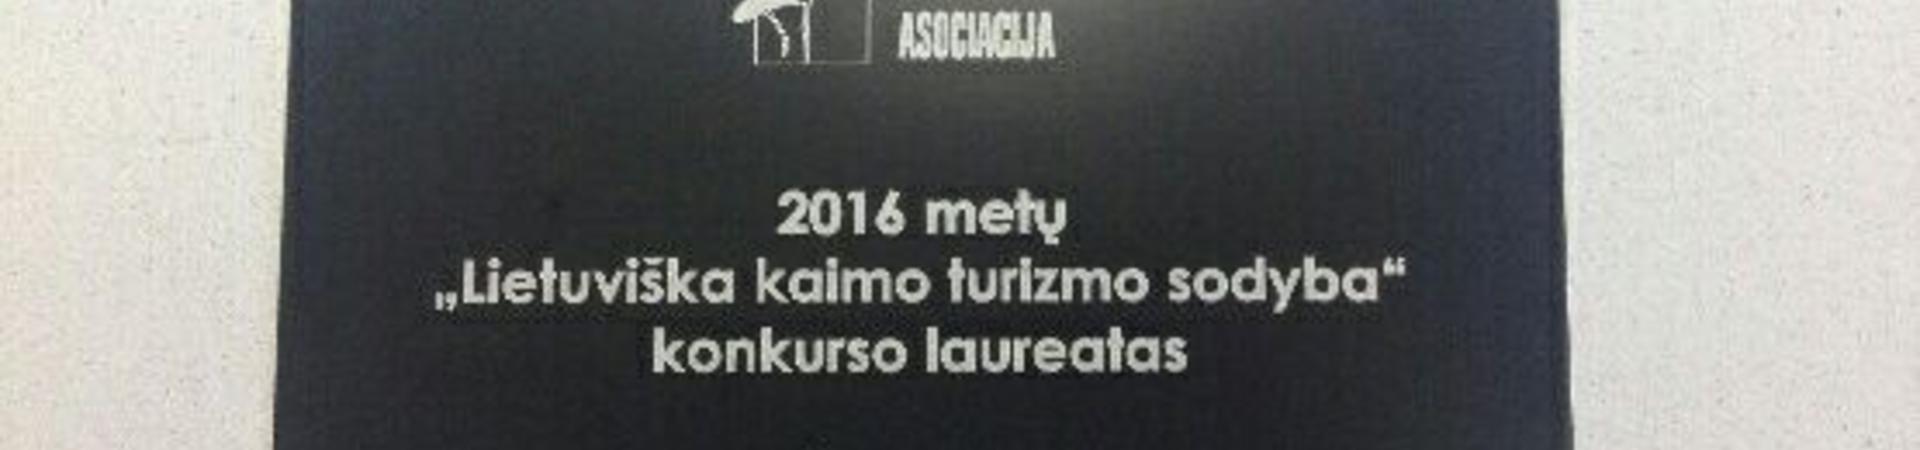 """Kliukai"" – lietuviška kaimo turizmo sodyba"